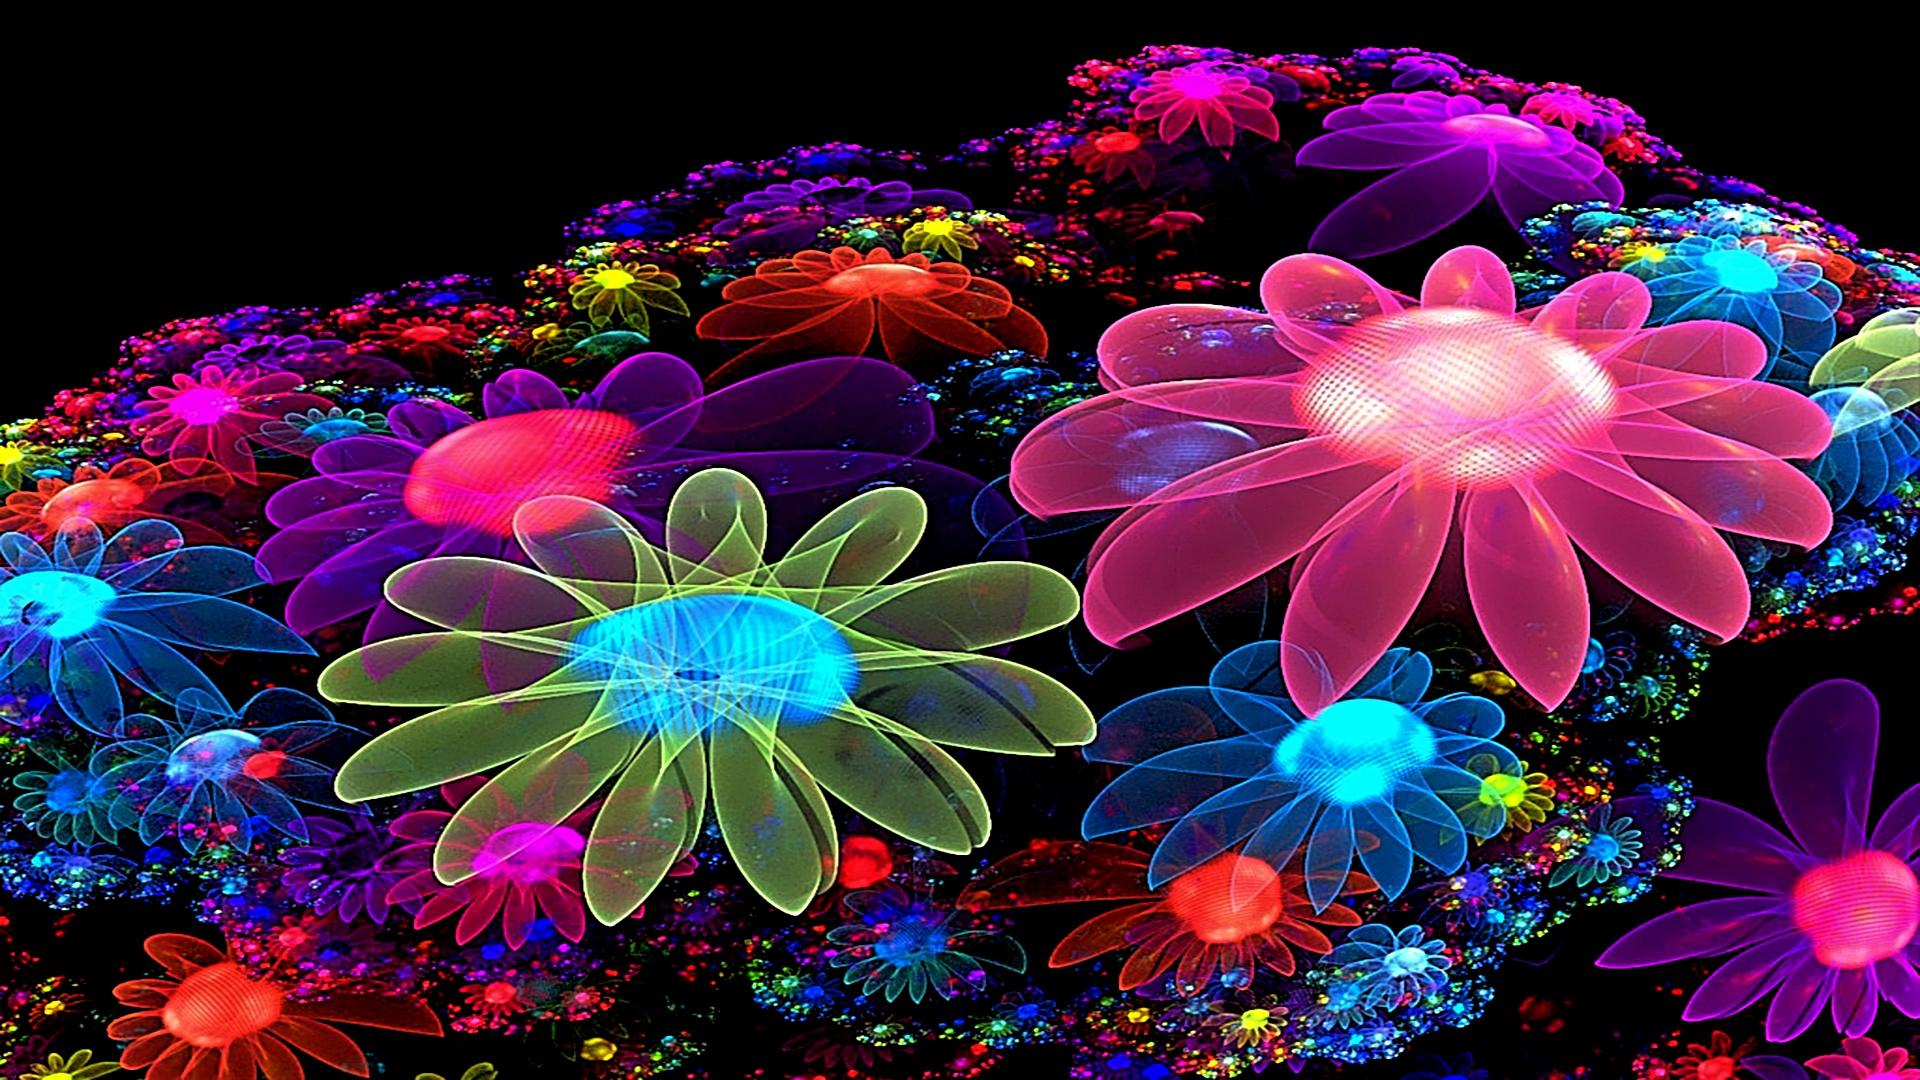 Desktop Wallpapers Images 8221 HD Wallpaper 3D Desktop 1920x1080